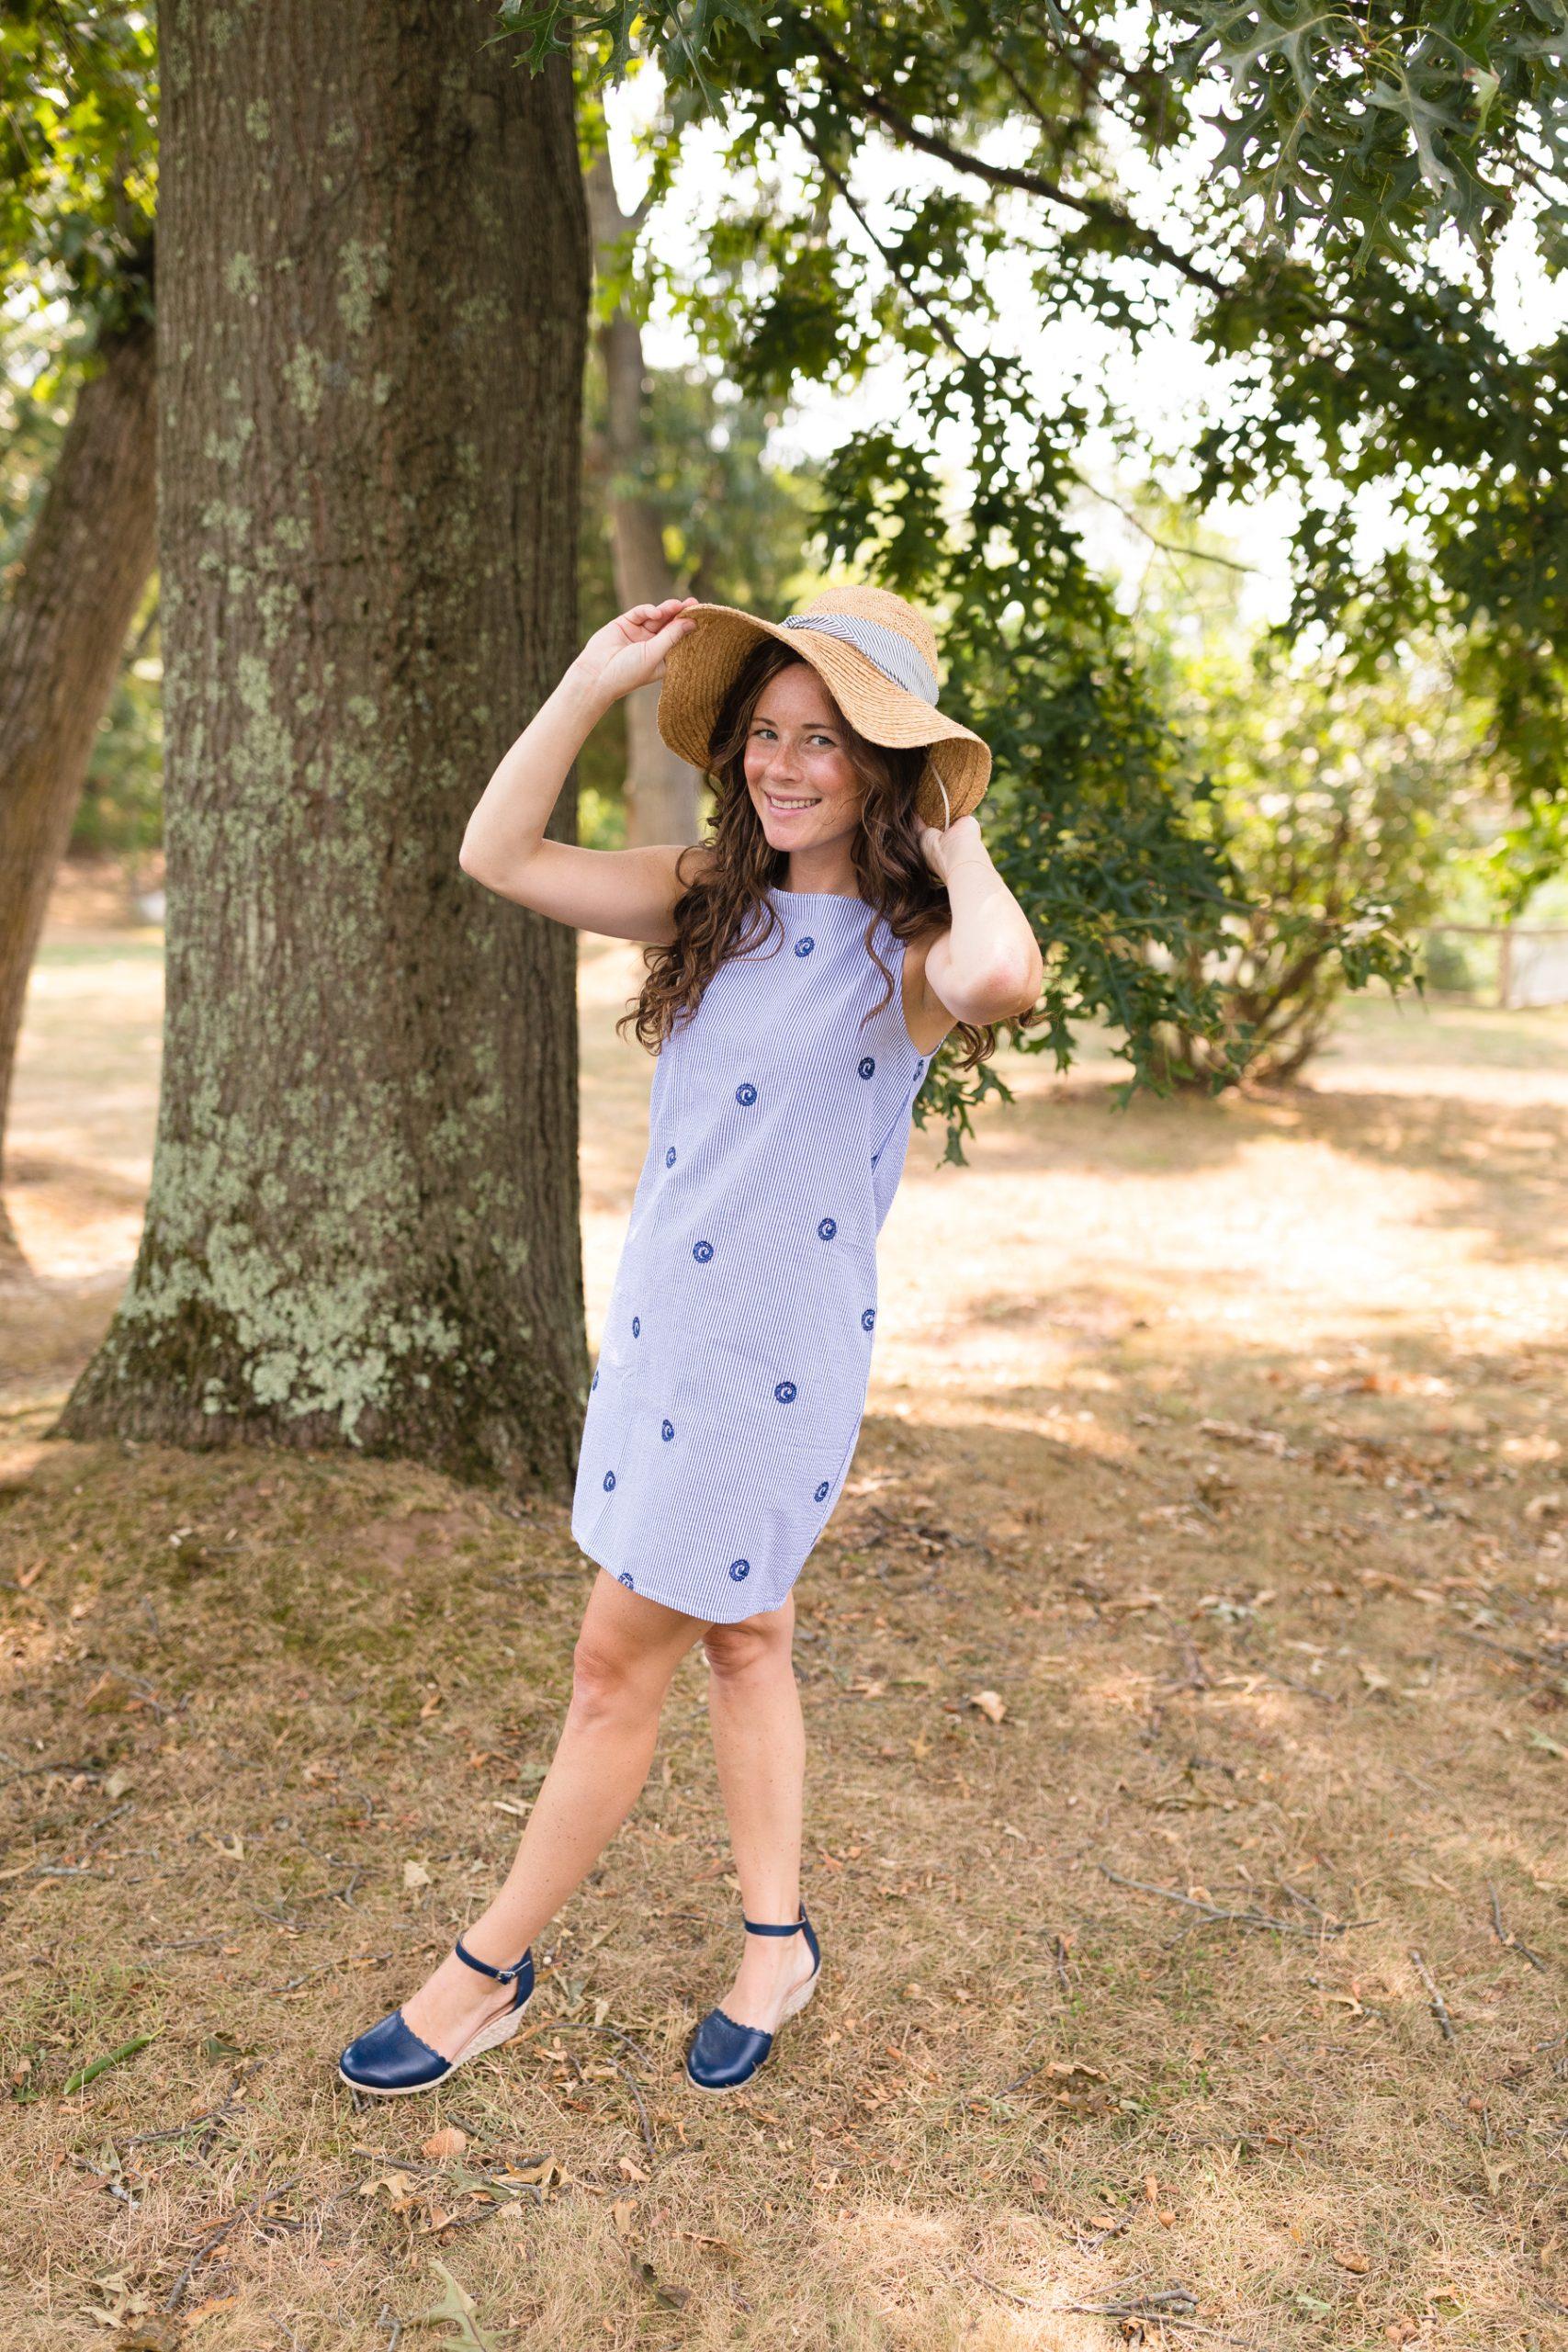 Caitlin Houston wearing Piping Prints Nantucket Dress